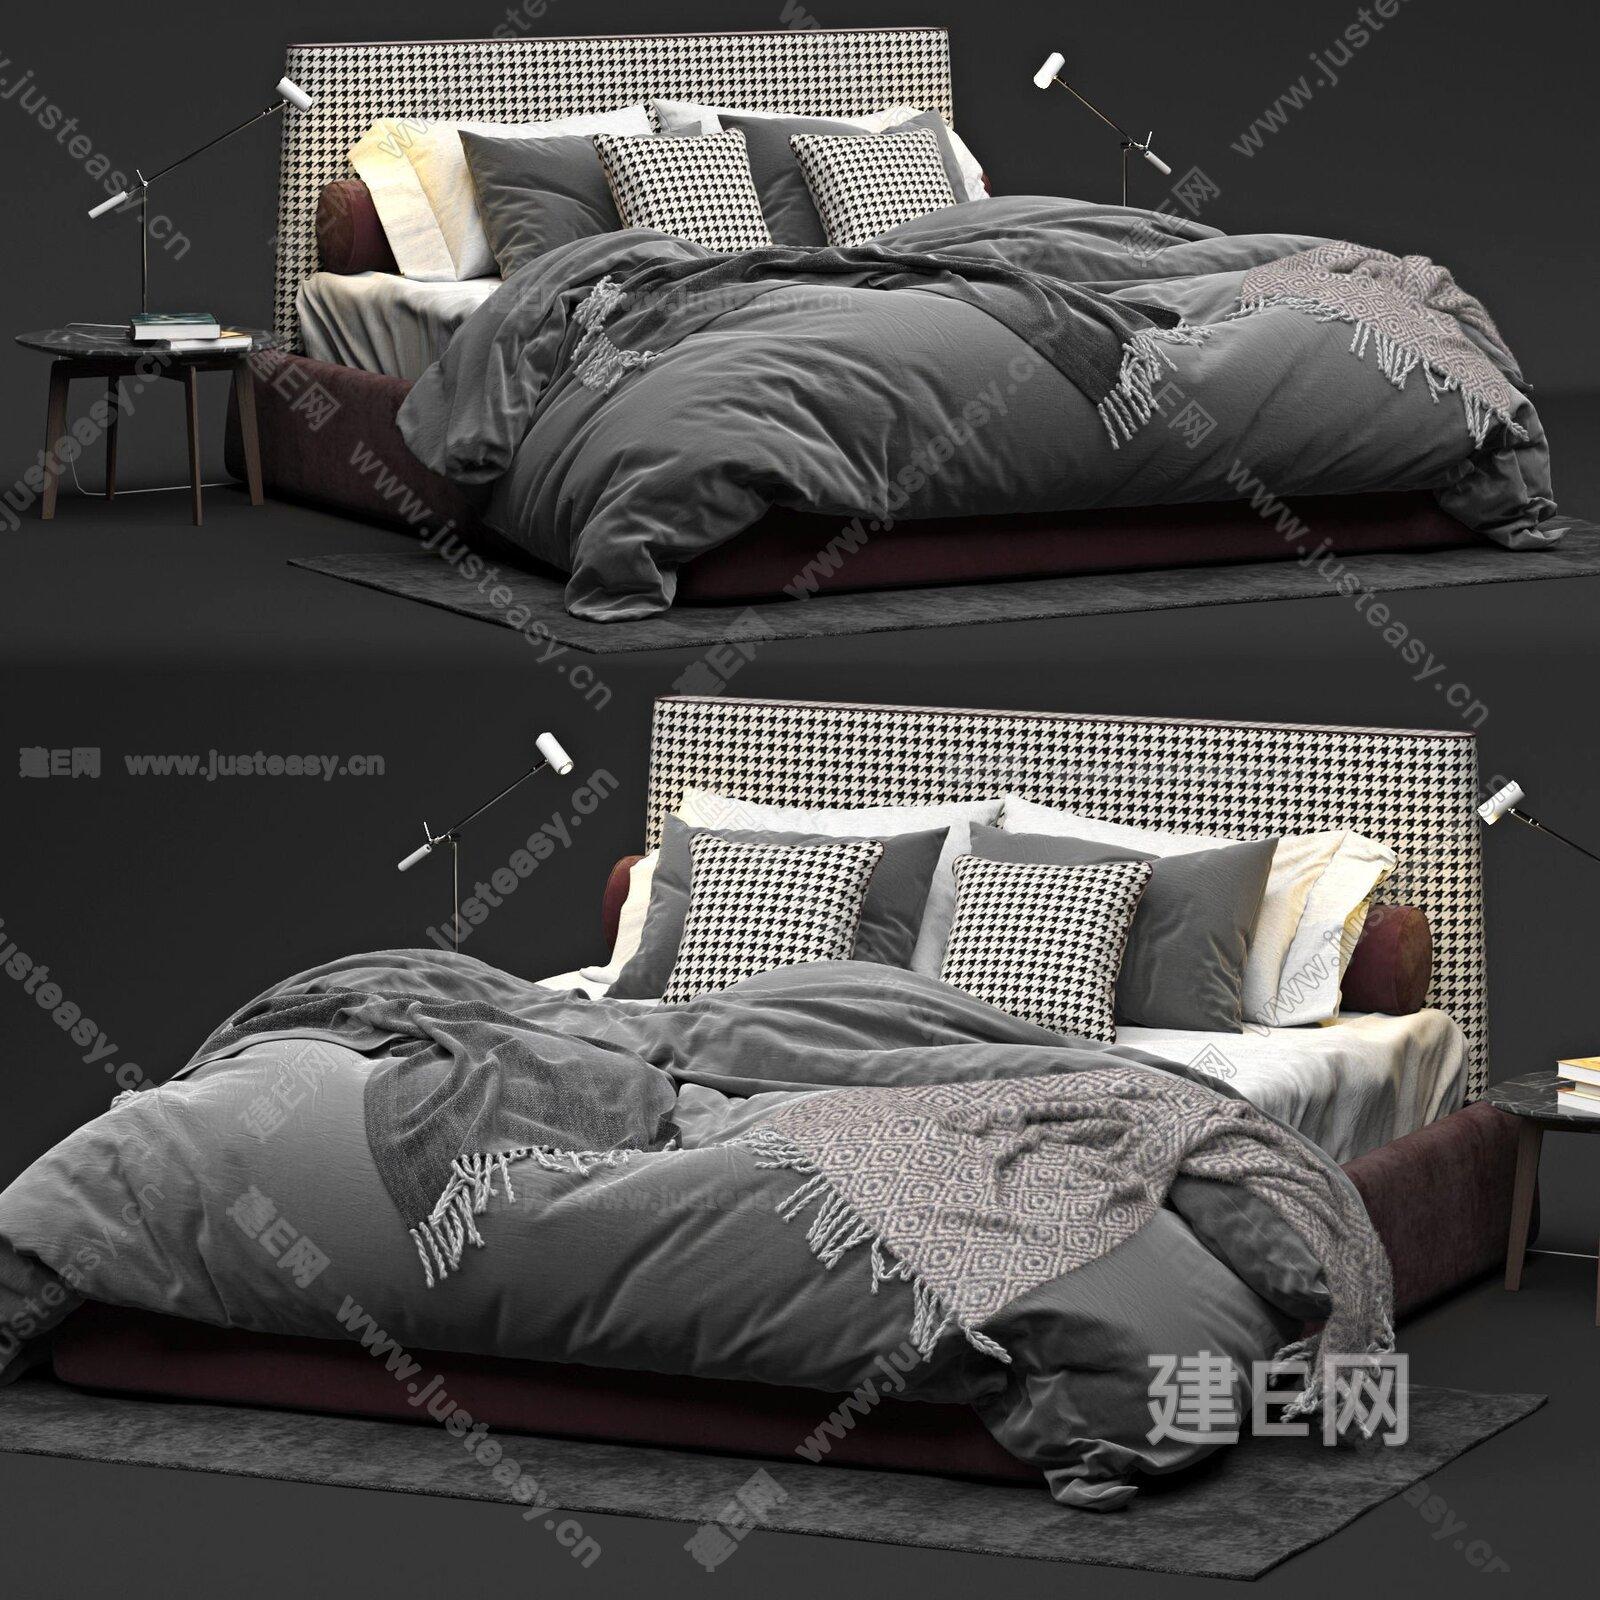 Twils 现代双人床3d模型